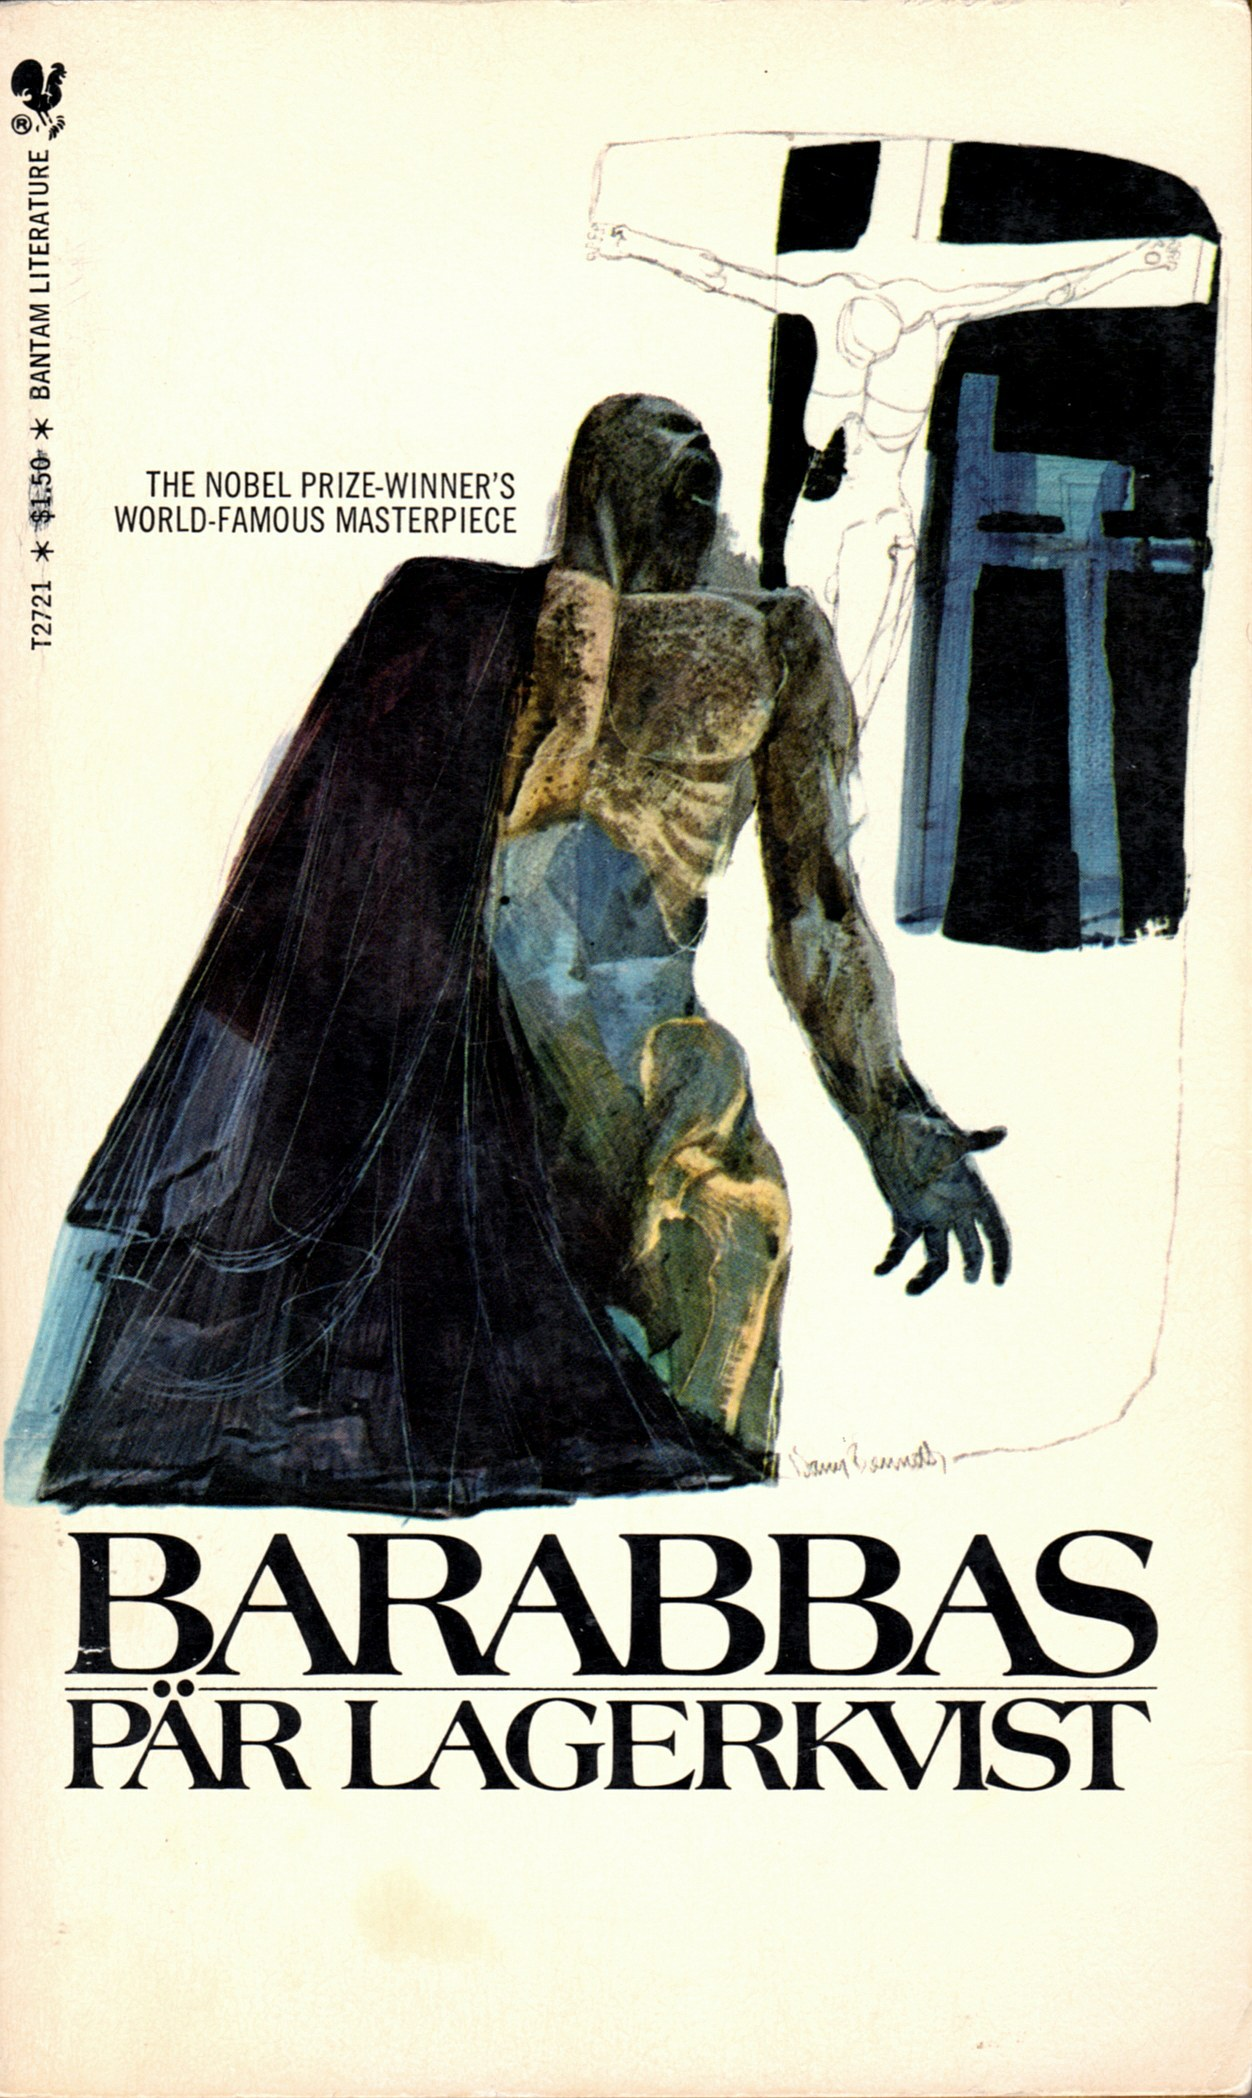 harry-bennett_barabbas_ny-bantam-1972_t2721